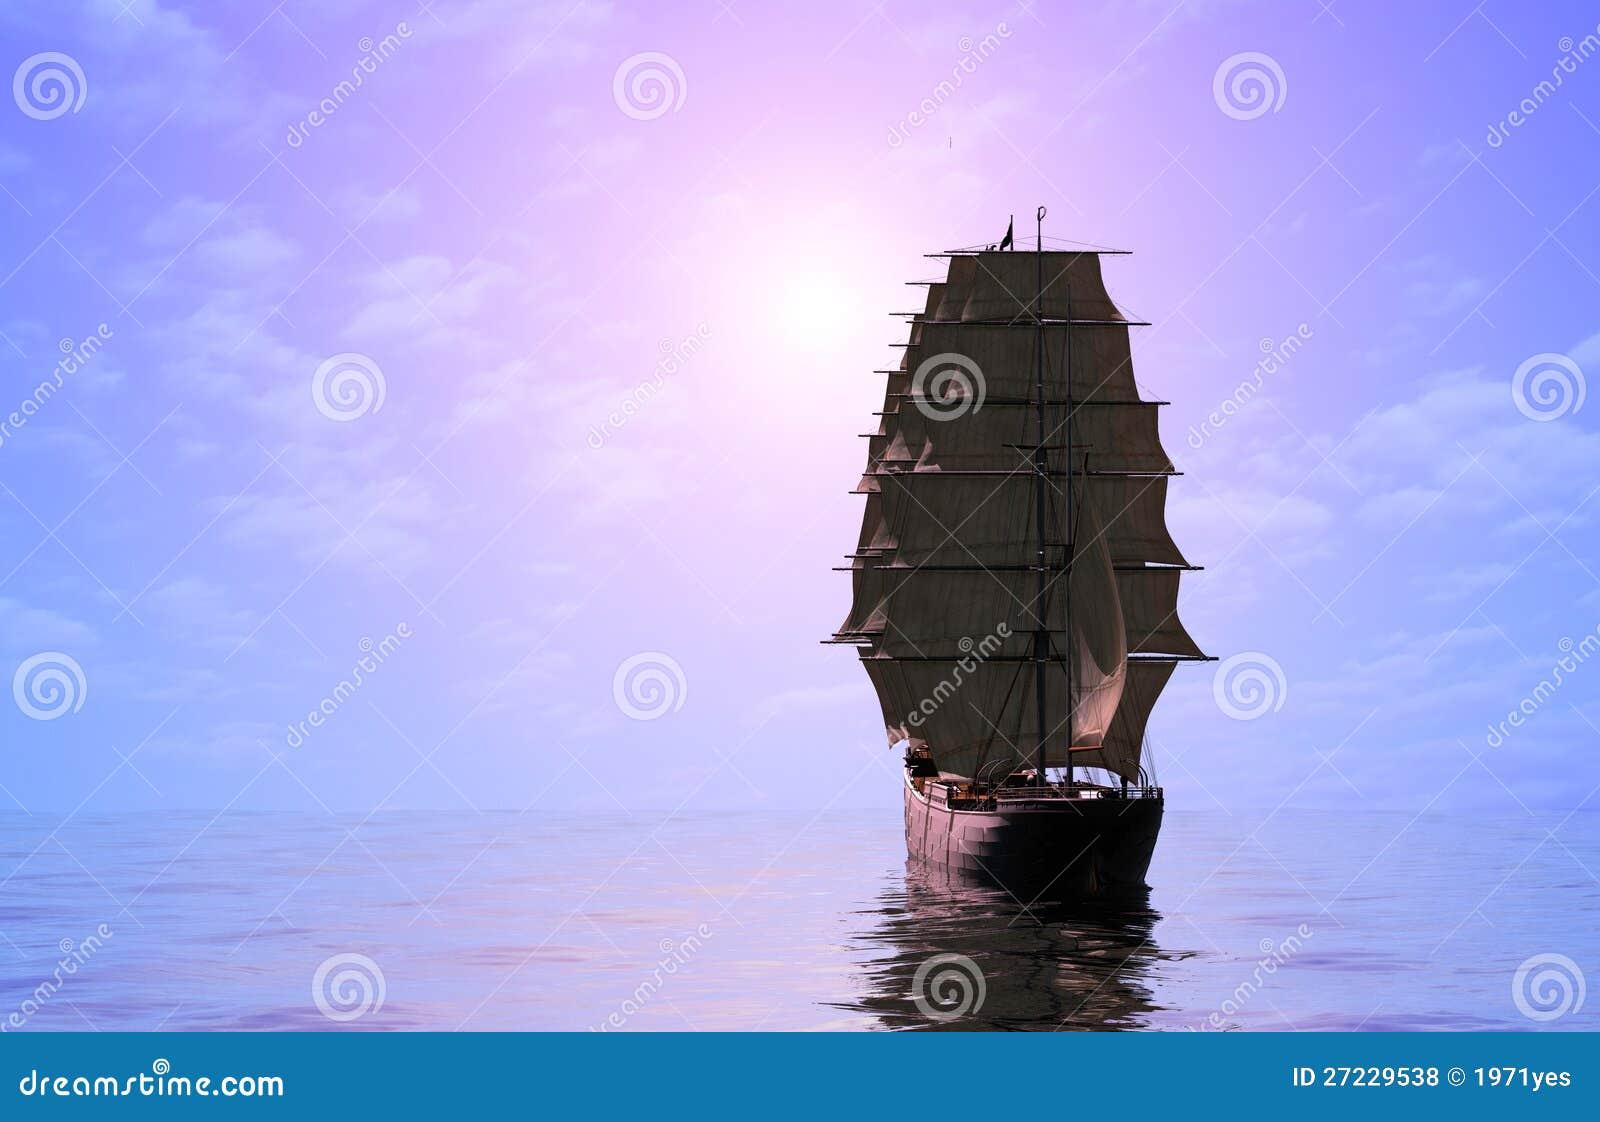 Żaglówka w morzu.